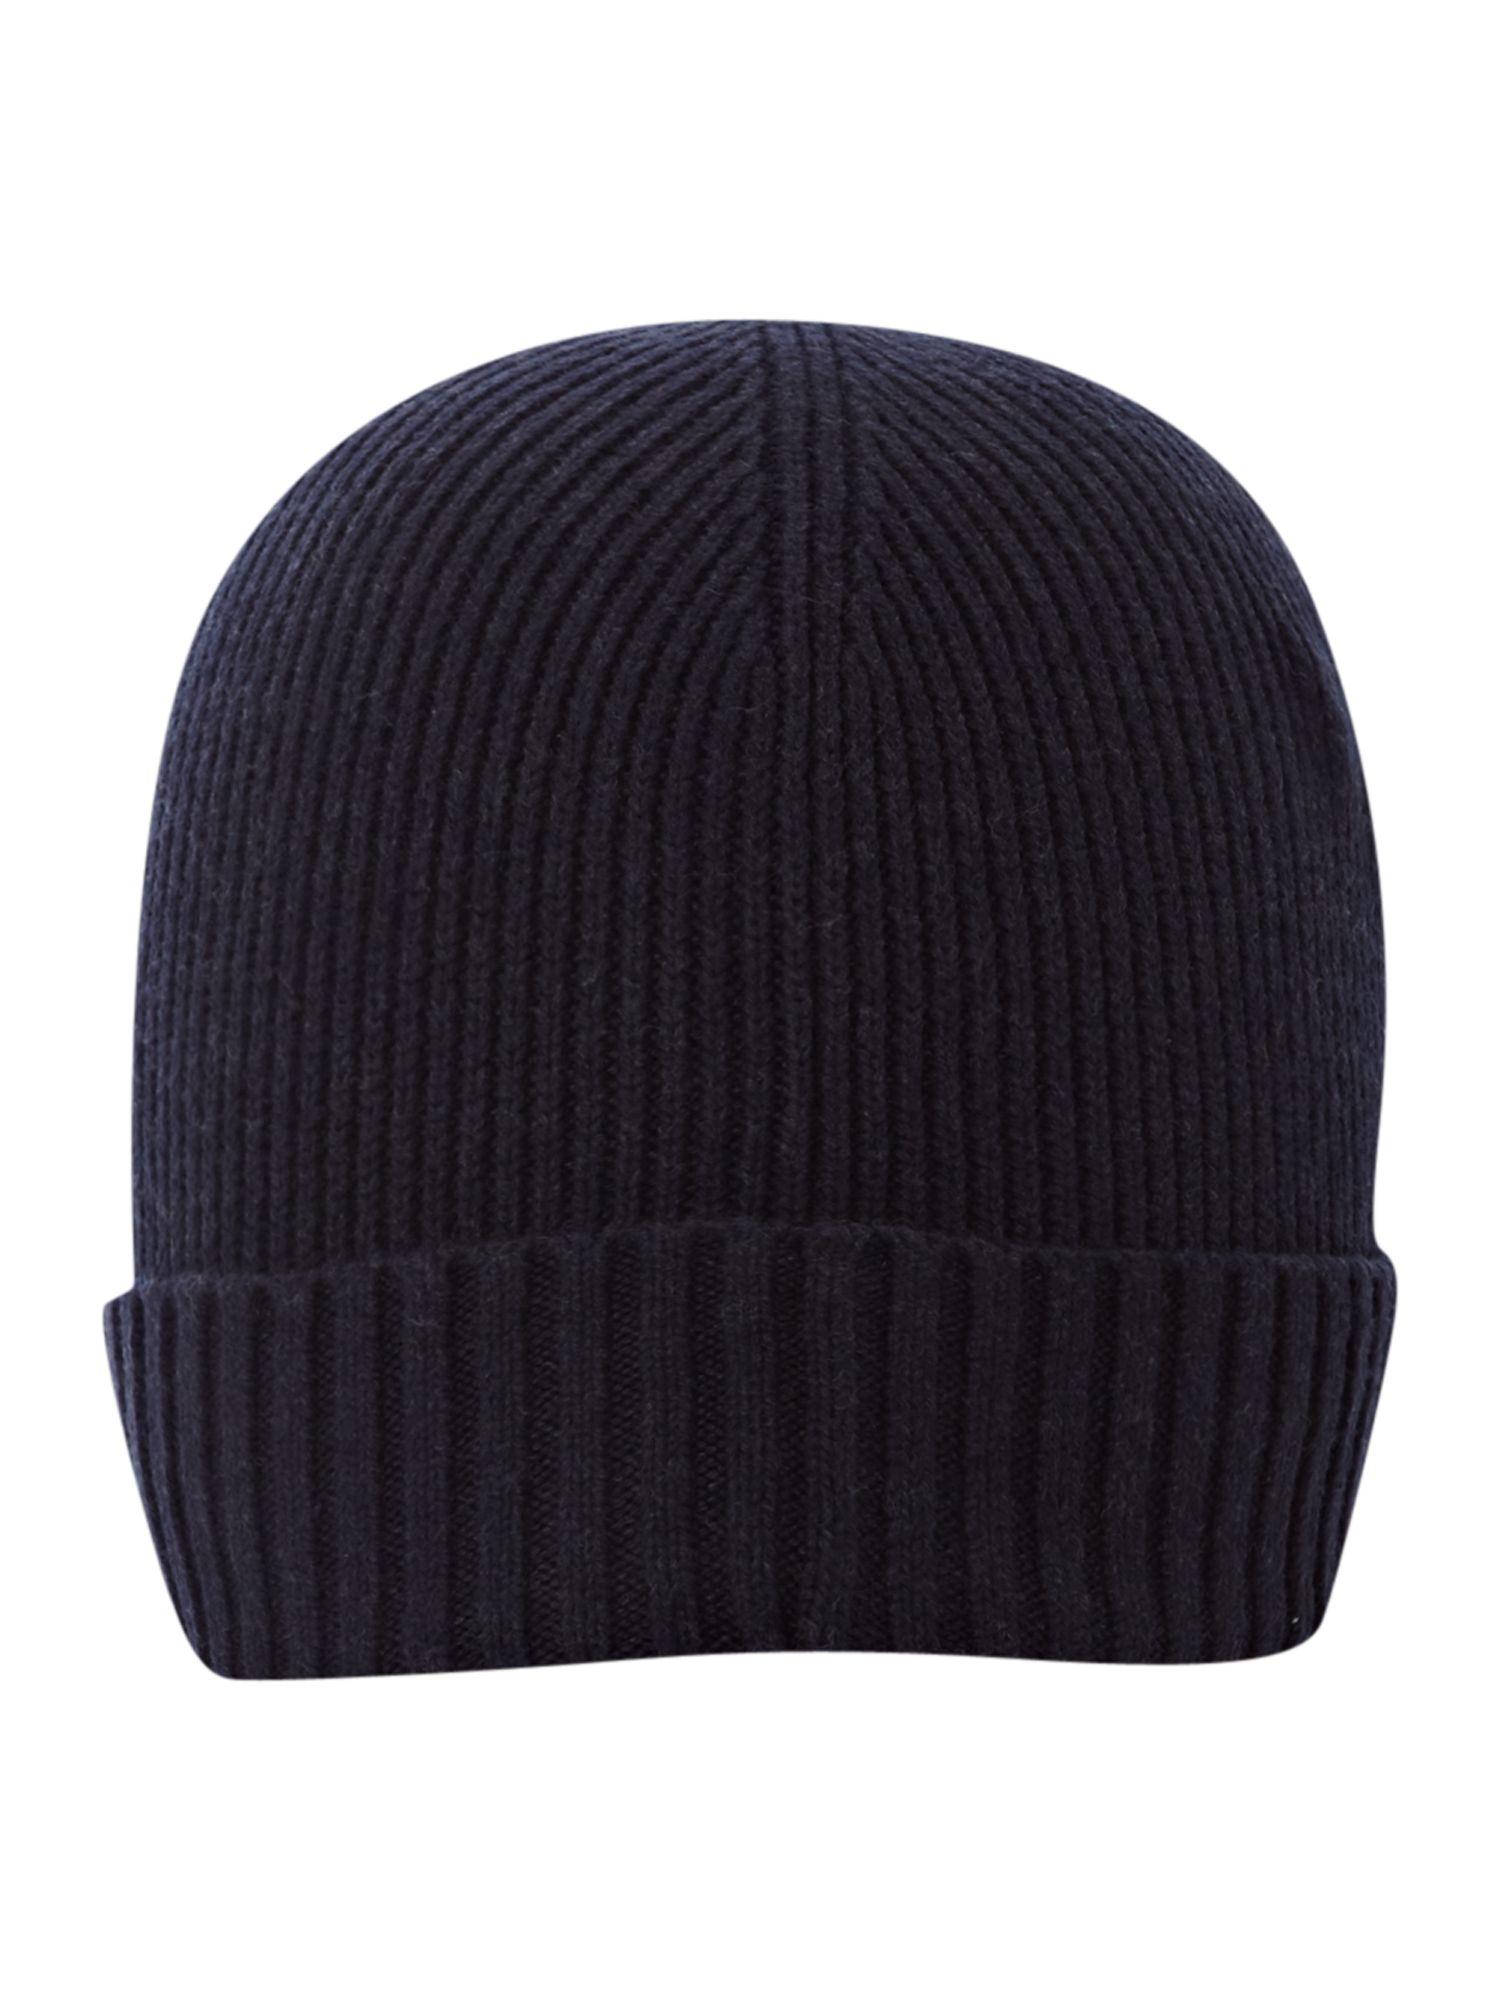 Tommy Hilfiger Beanie Hat In Midnight Blue For Men Lyst